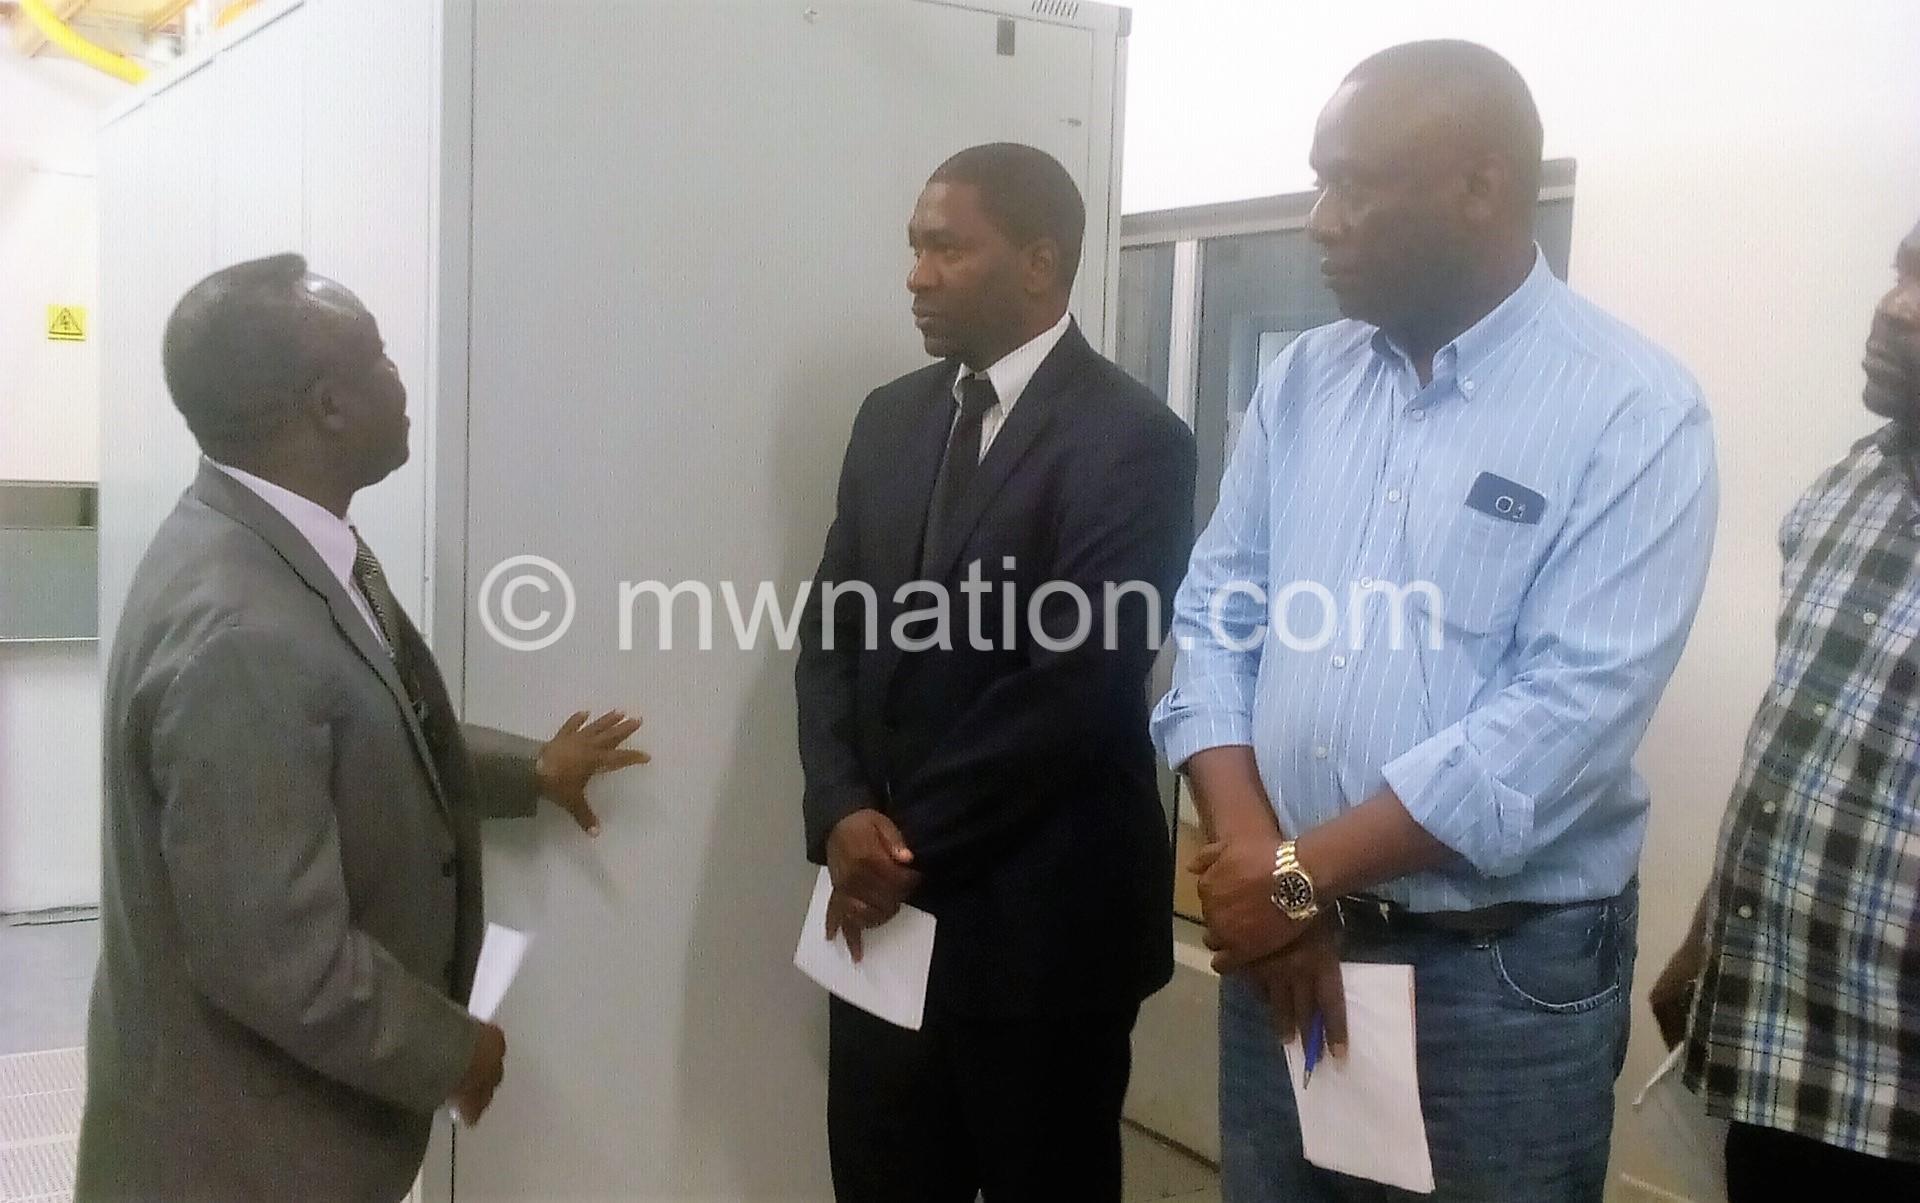 Kawale mwenefumbo fiber | The Nation Online